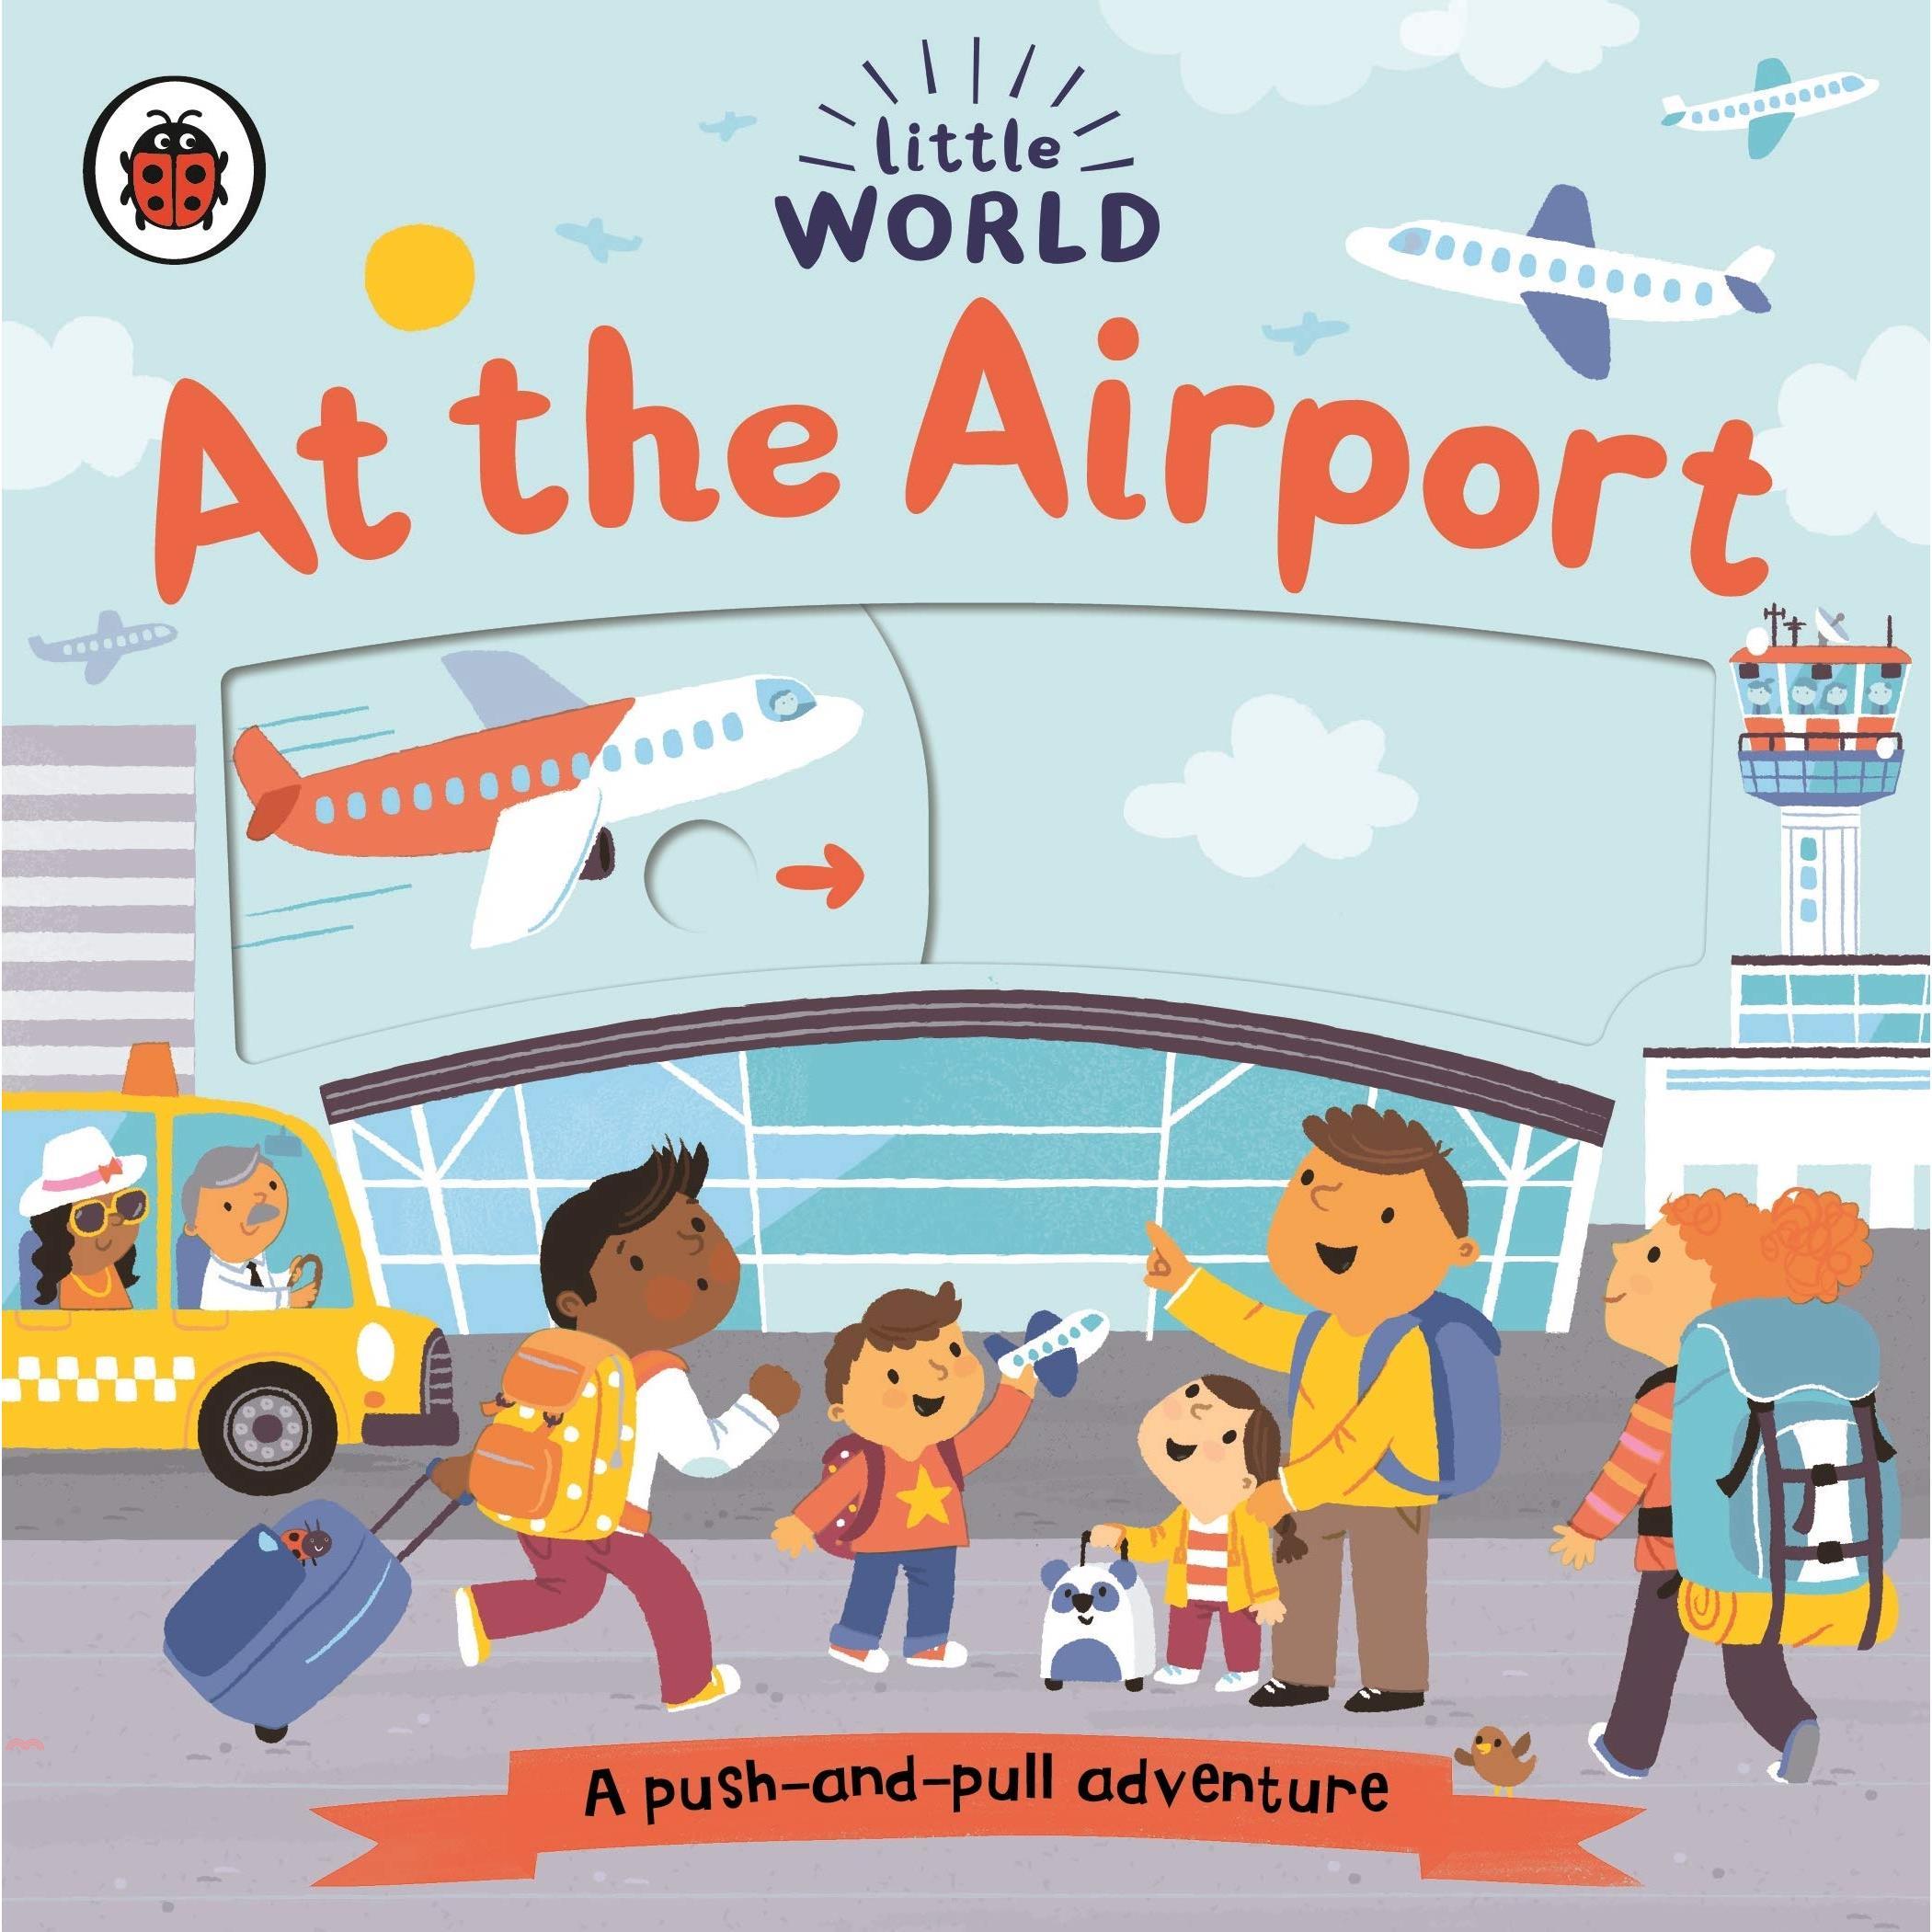 Little World: At the Airport (硬頁推拉書)【三民網路書店】(硬頁書)[75折]